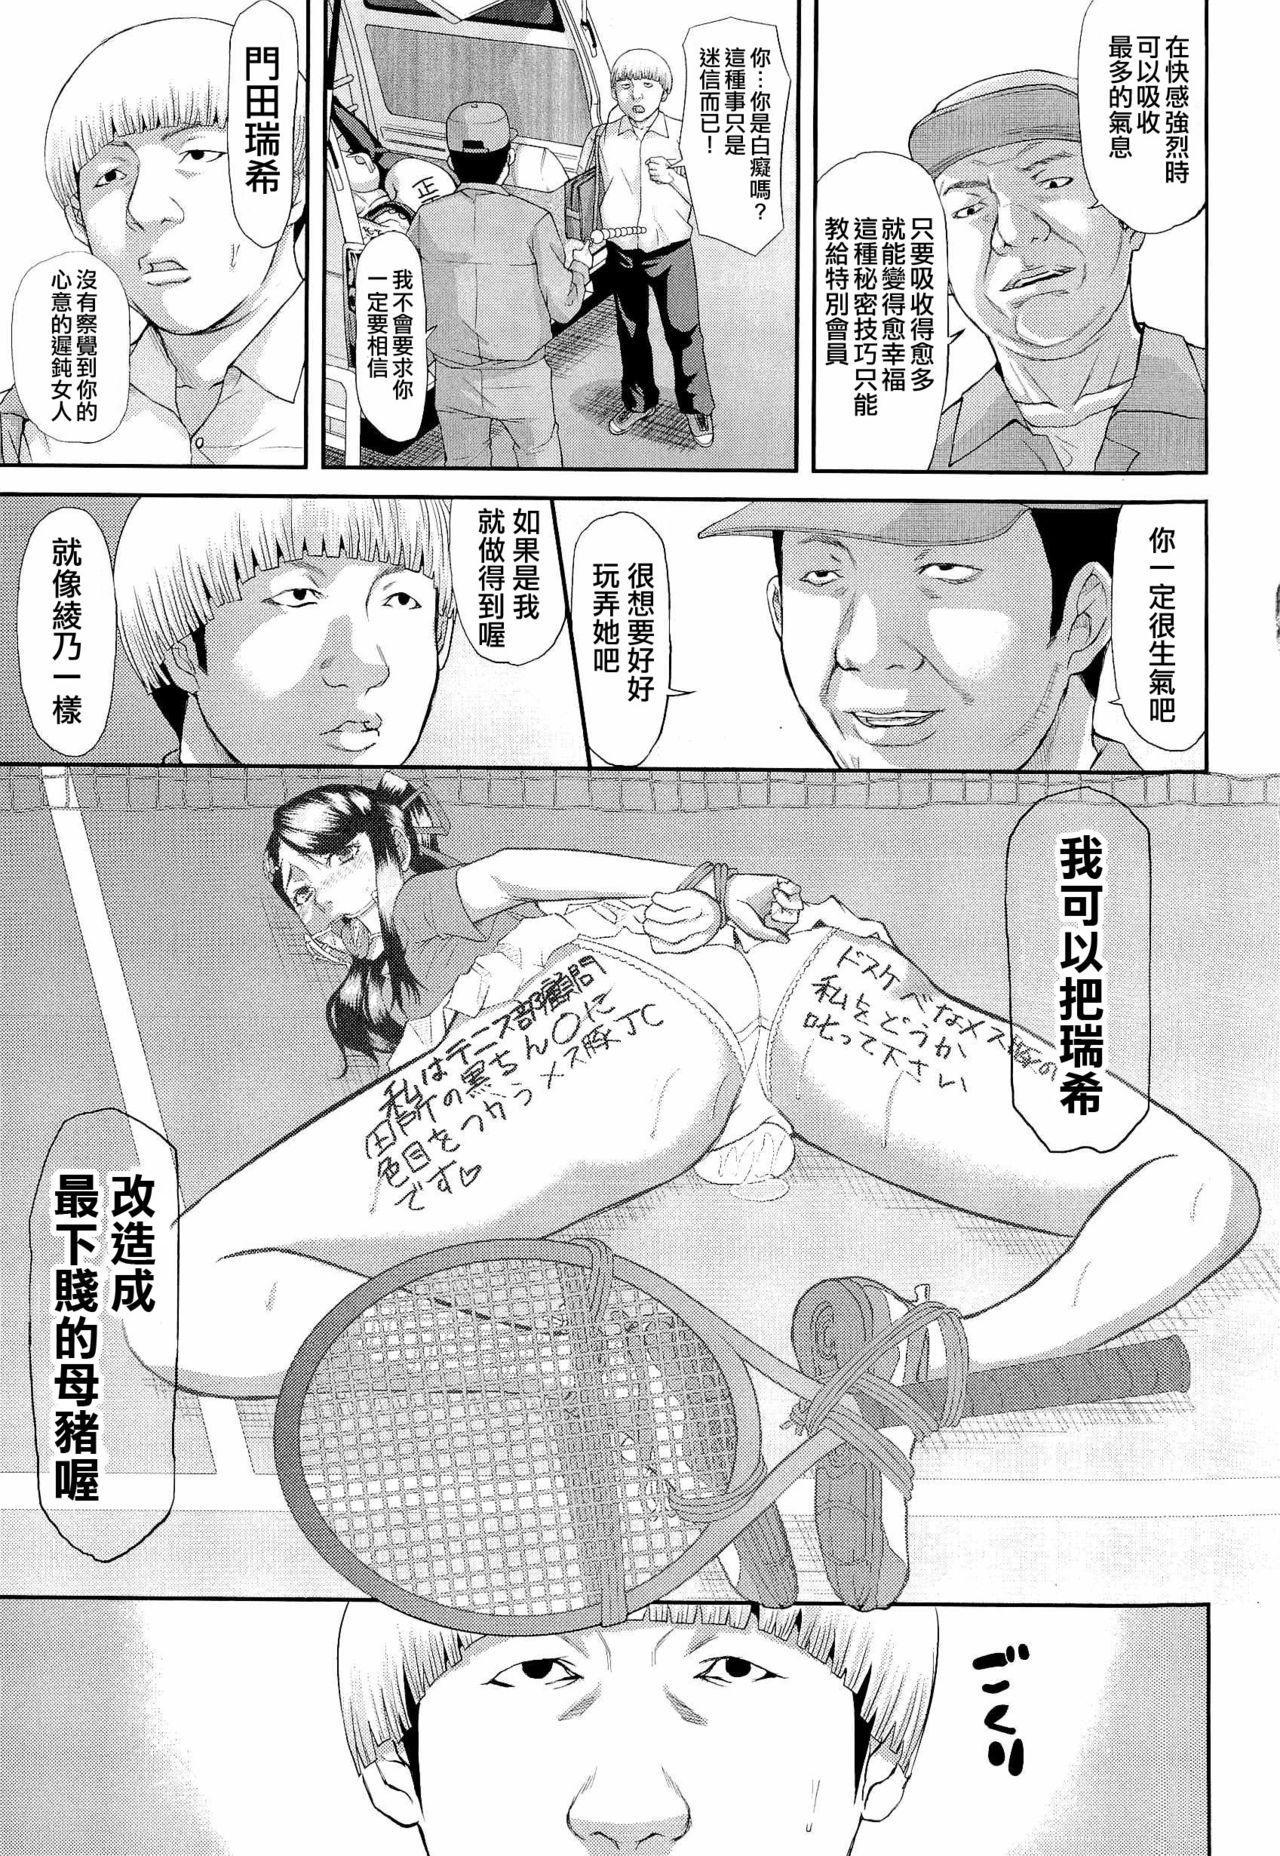 [Honebuto Danshaku] Innou Kaizou Program ~Oyako Zecchou Cult Ochi~ [Chinese]【不想记名重嵌--高质量图源】 36